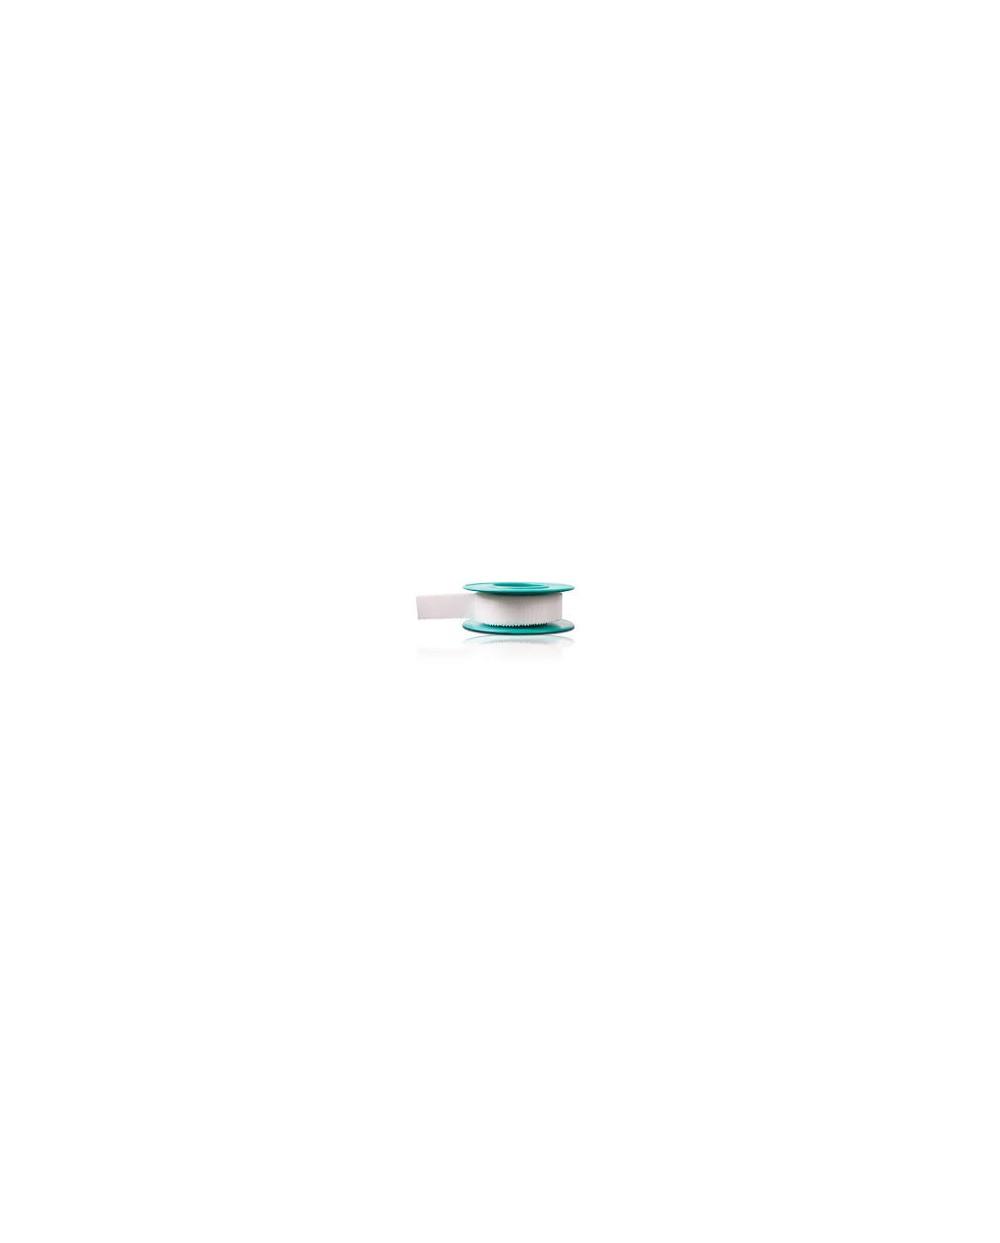 Tape Kliniplast Silk, 2,5 cm x 5,1 m, non stérile Boîte de 12 bobines